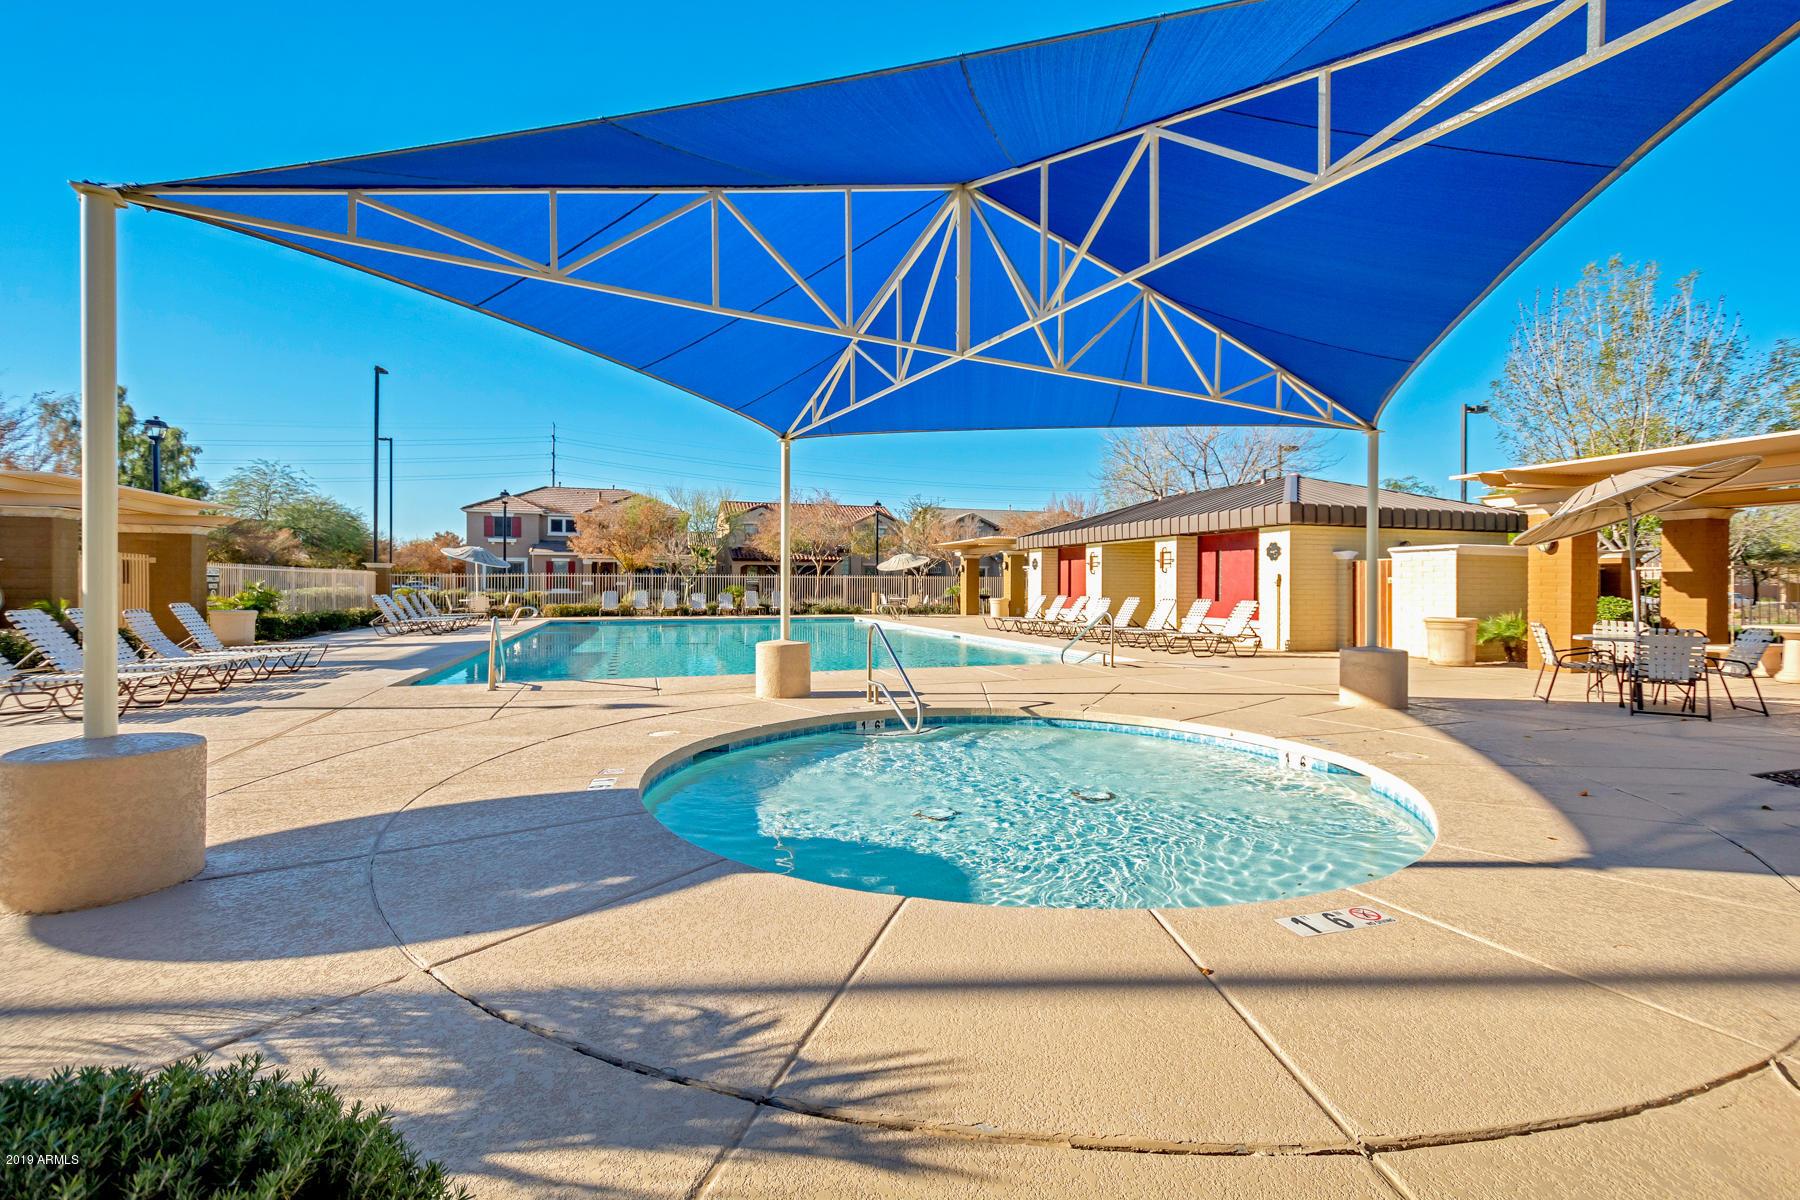 MLS 5865787 2534 E MEGAN Street, Gilbert, AZ 85295 Lyons Gate